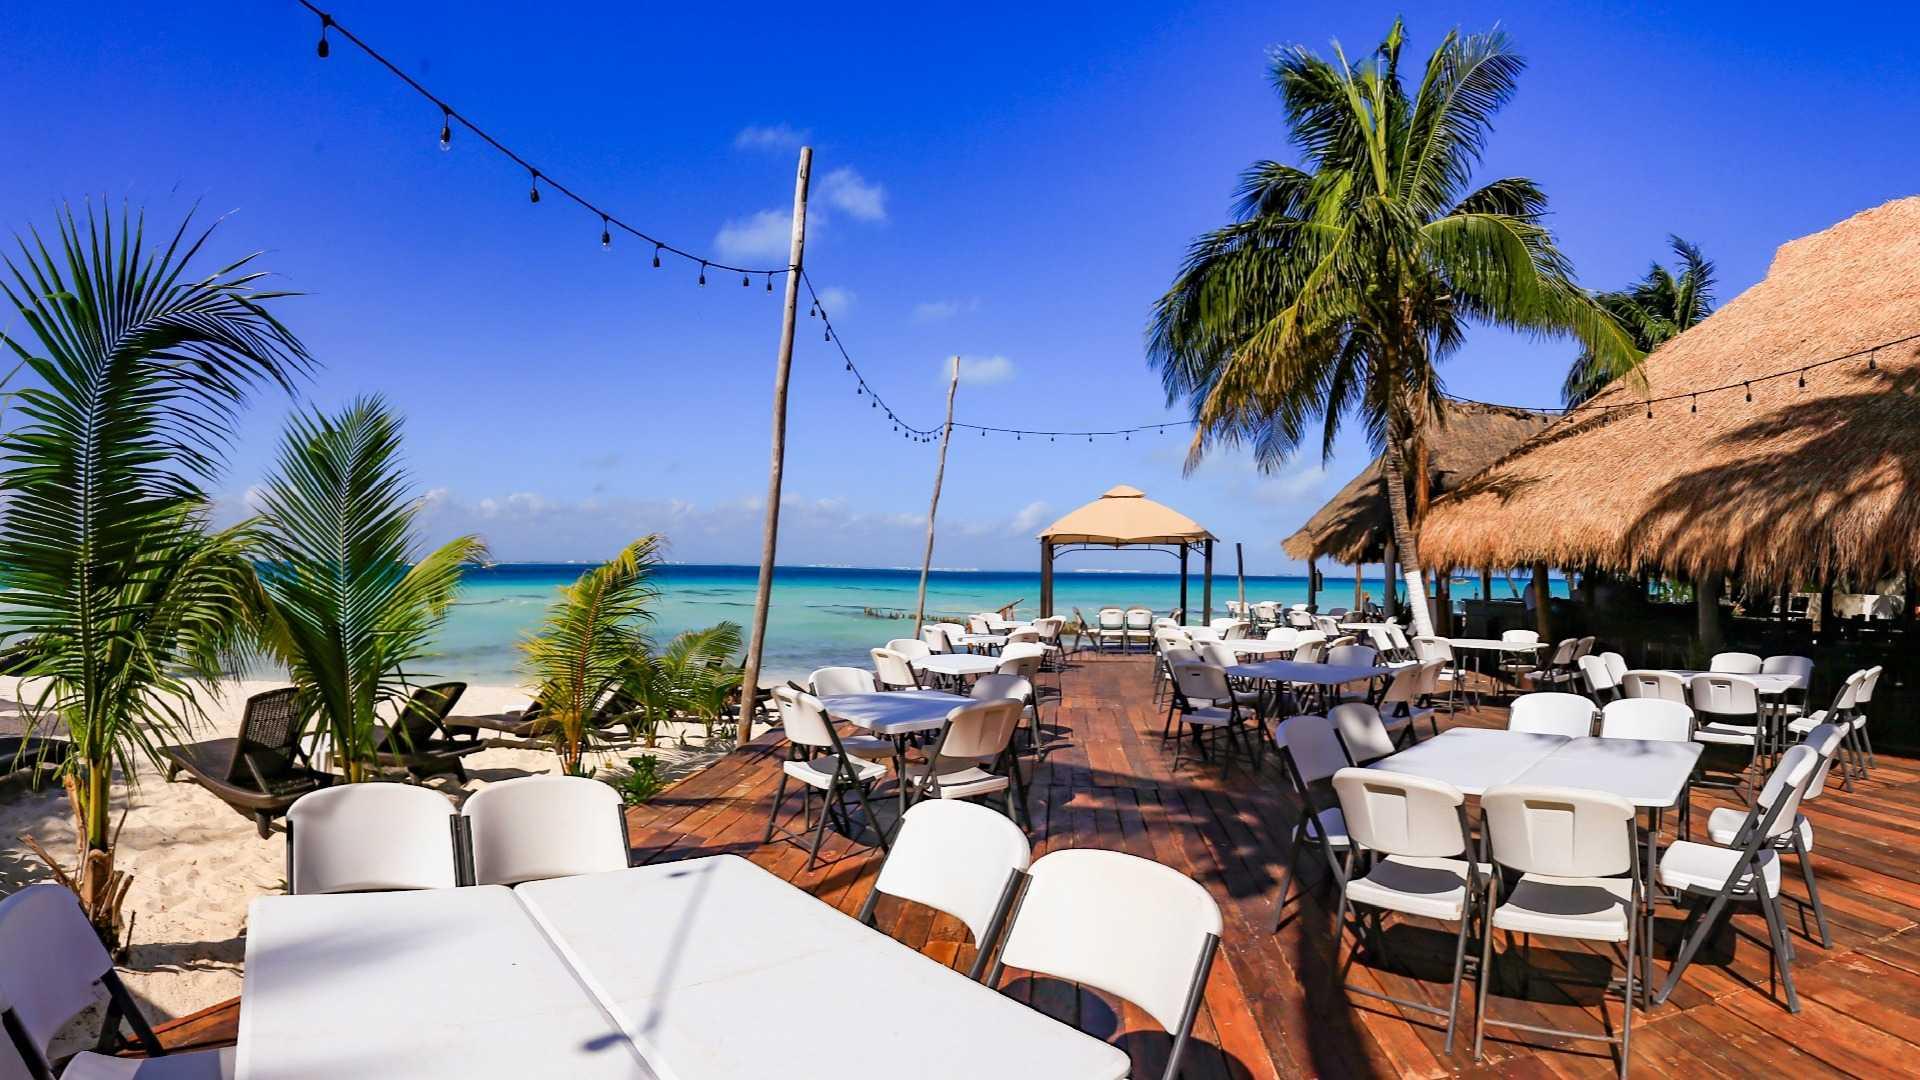 02 - Lowres - Club de playa Punta Blanca - Isla Mujeres